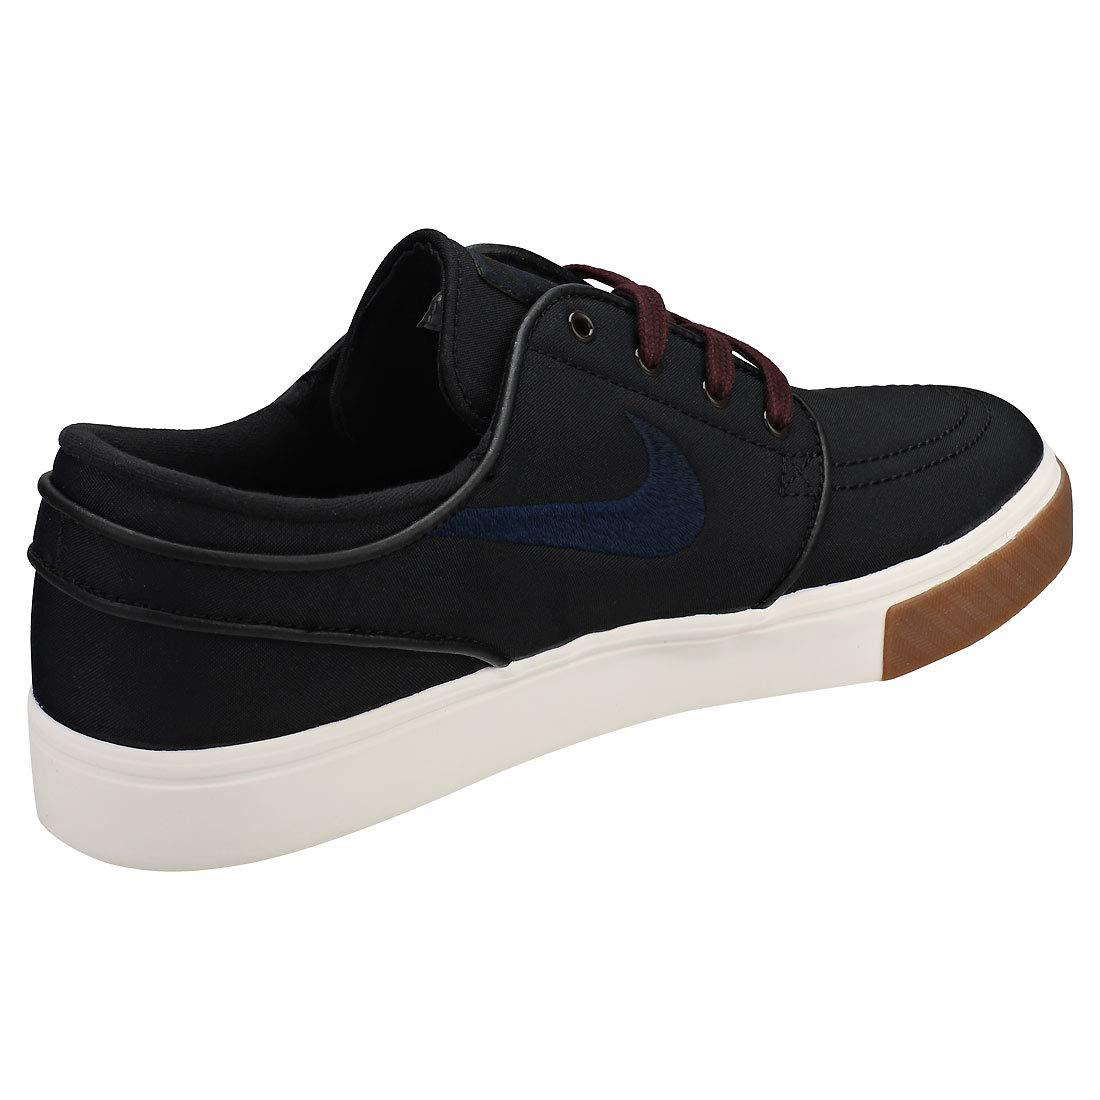 meet 43d08 fceb4 Amazon.com   Nike SB Stefan Janoski Max   Skateboarding